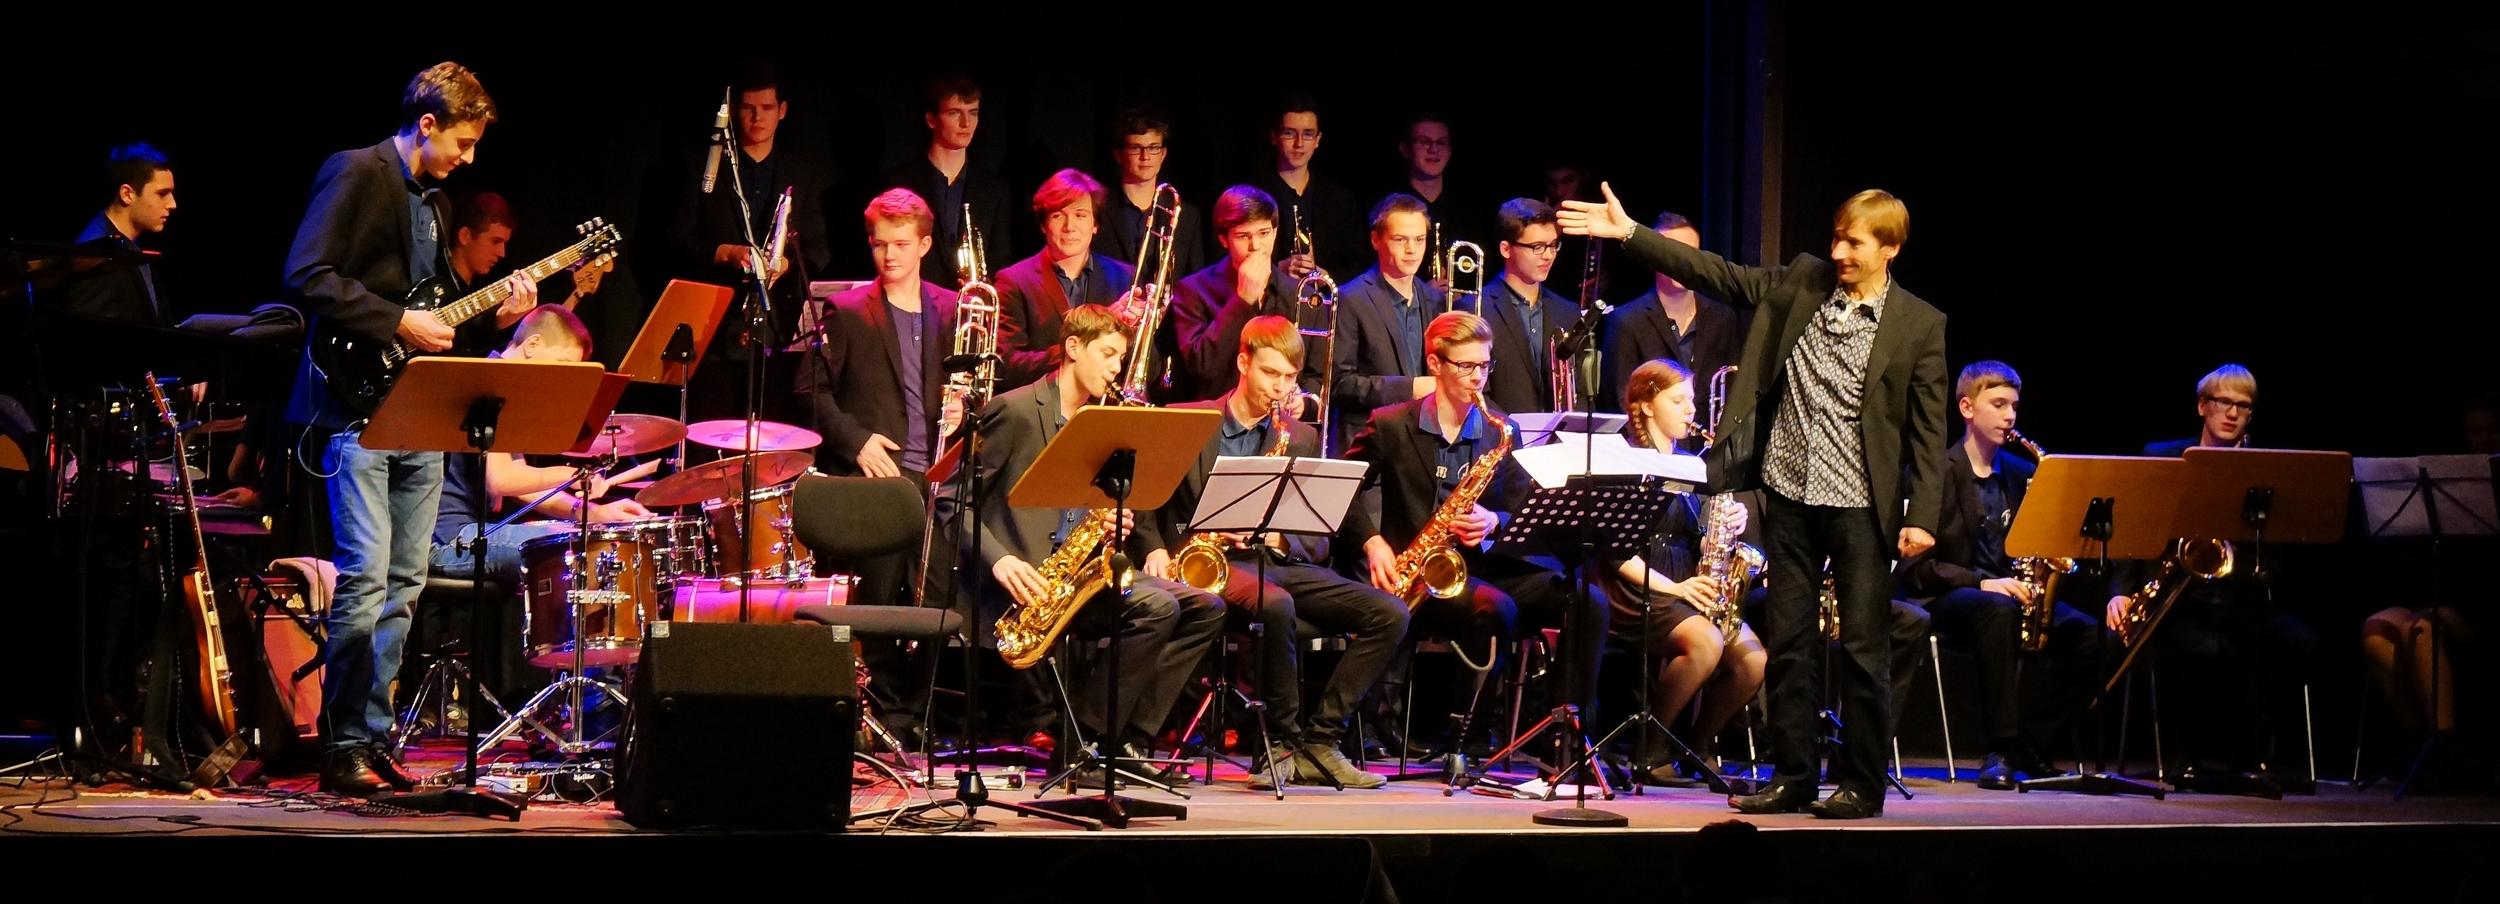 PFG - The new generation youth jazz